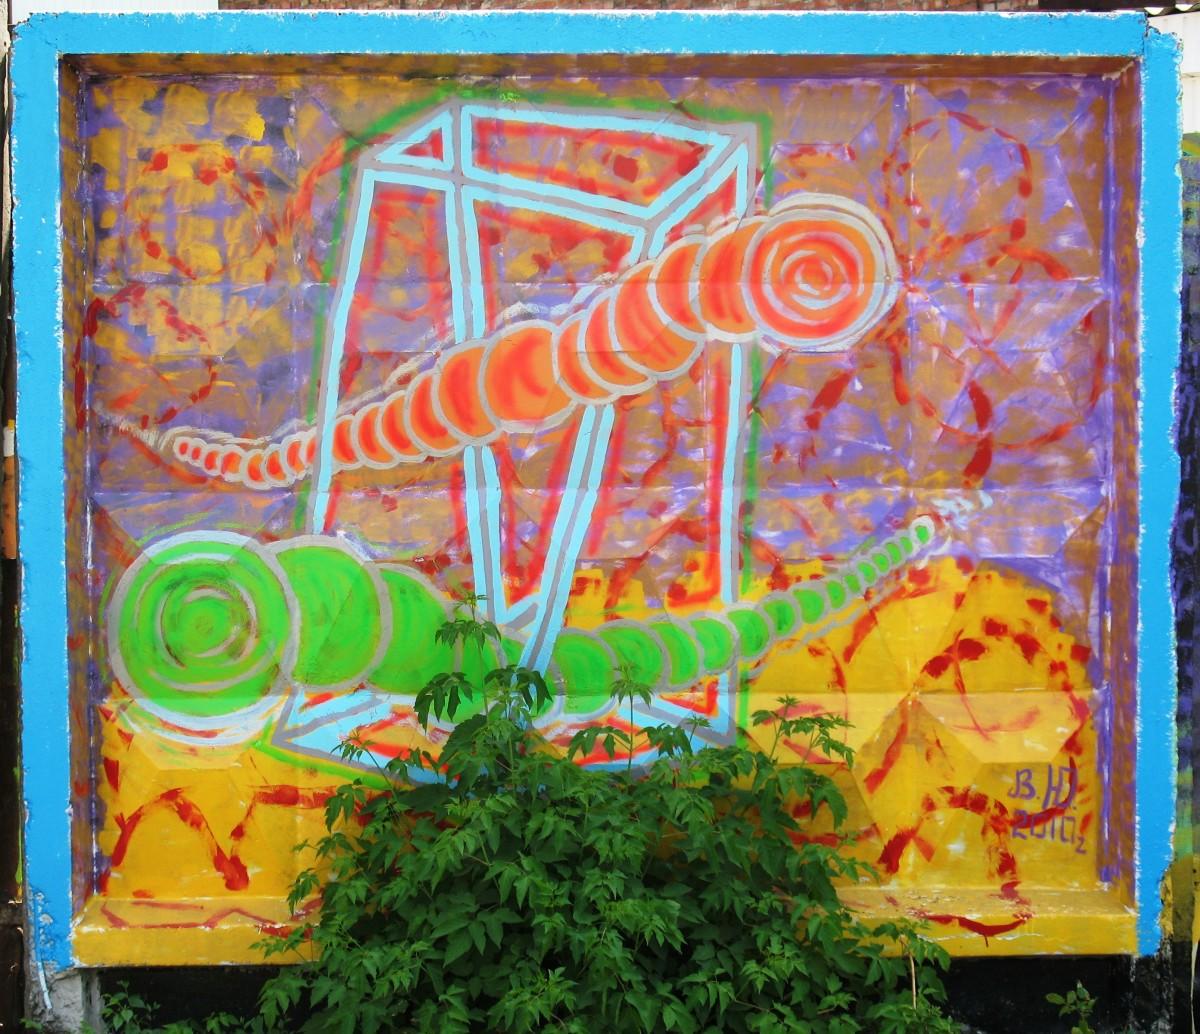 Mongolian death worm Olghoi on graffiti. Kharkov, 2009